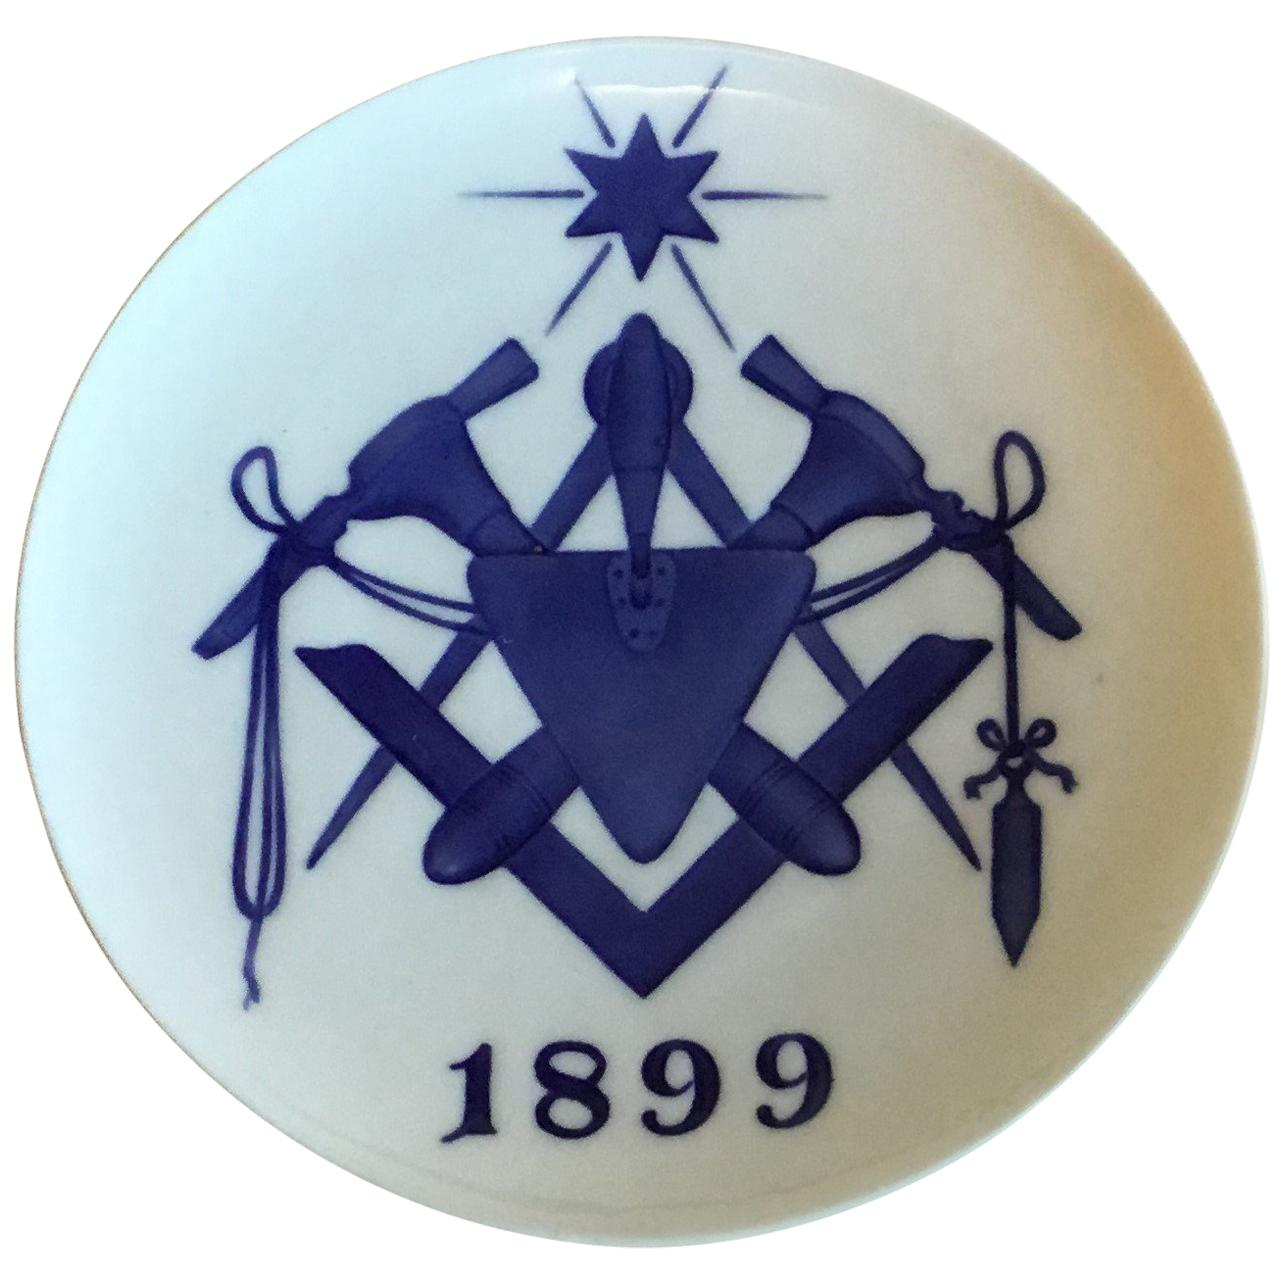 Royal Copenhagen Commemorative Plate from 1899 RC-CM34